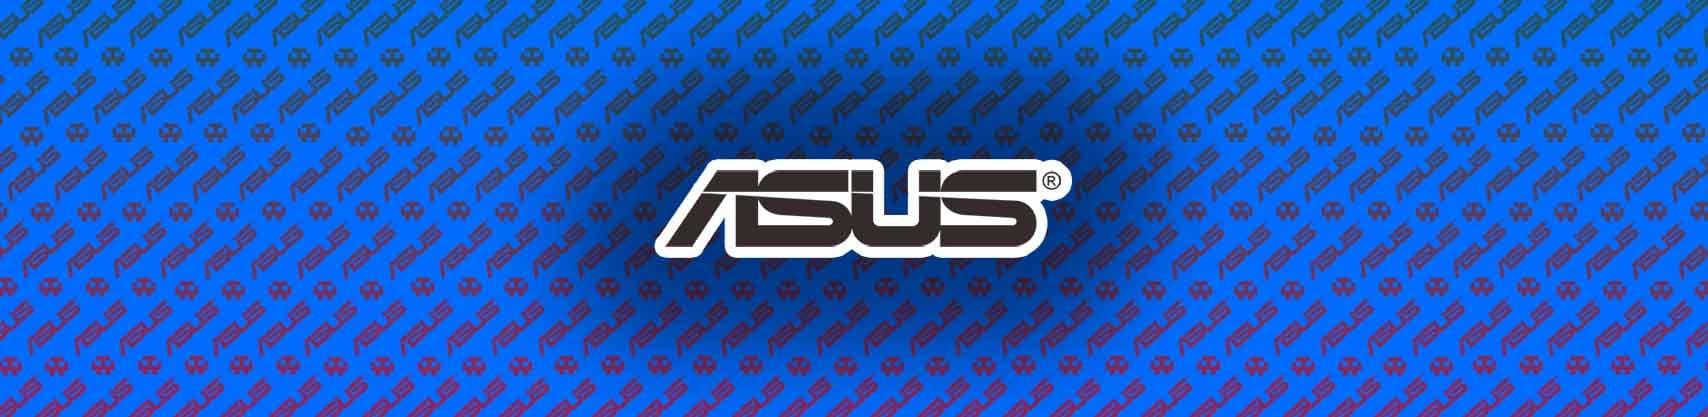 Asus ROG STRIX B350-F Manual